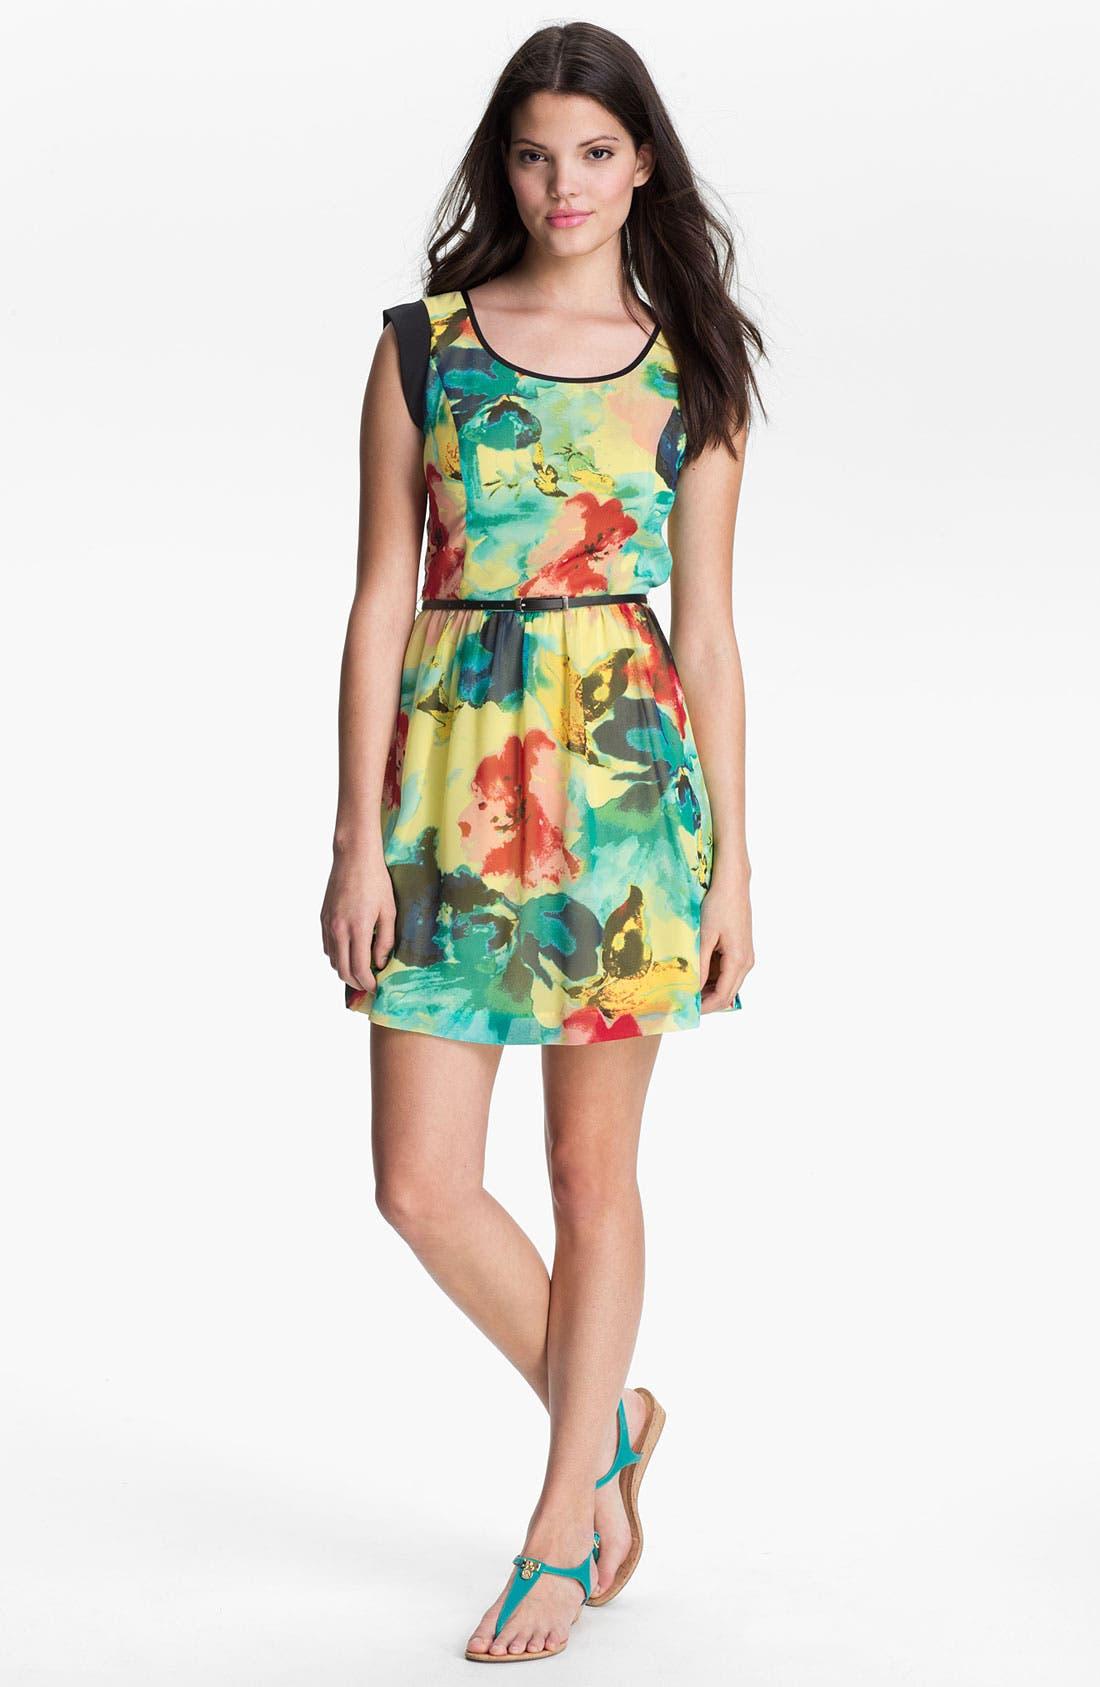 Alternate Image 1 Selected - Kensie 'Blurred Floral' Dress